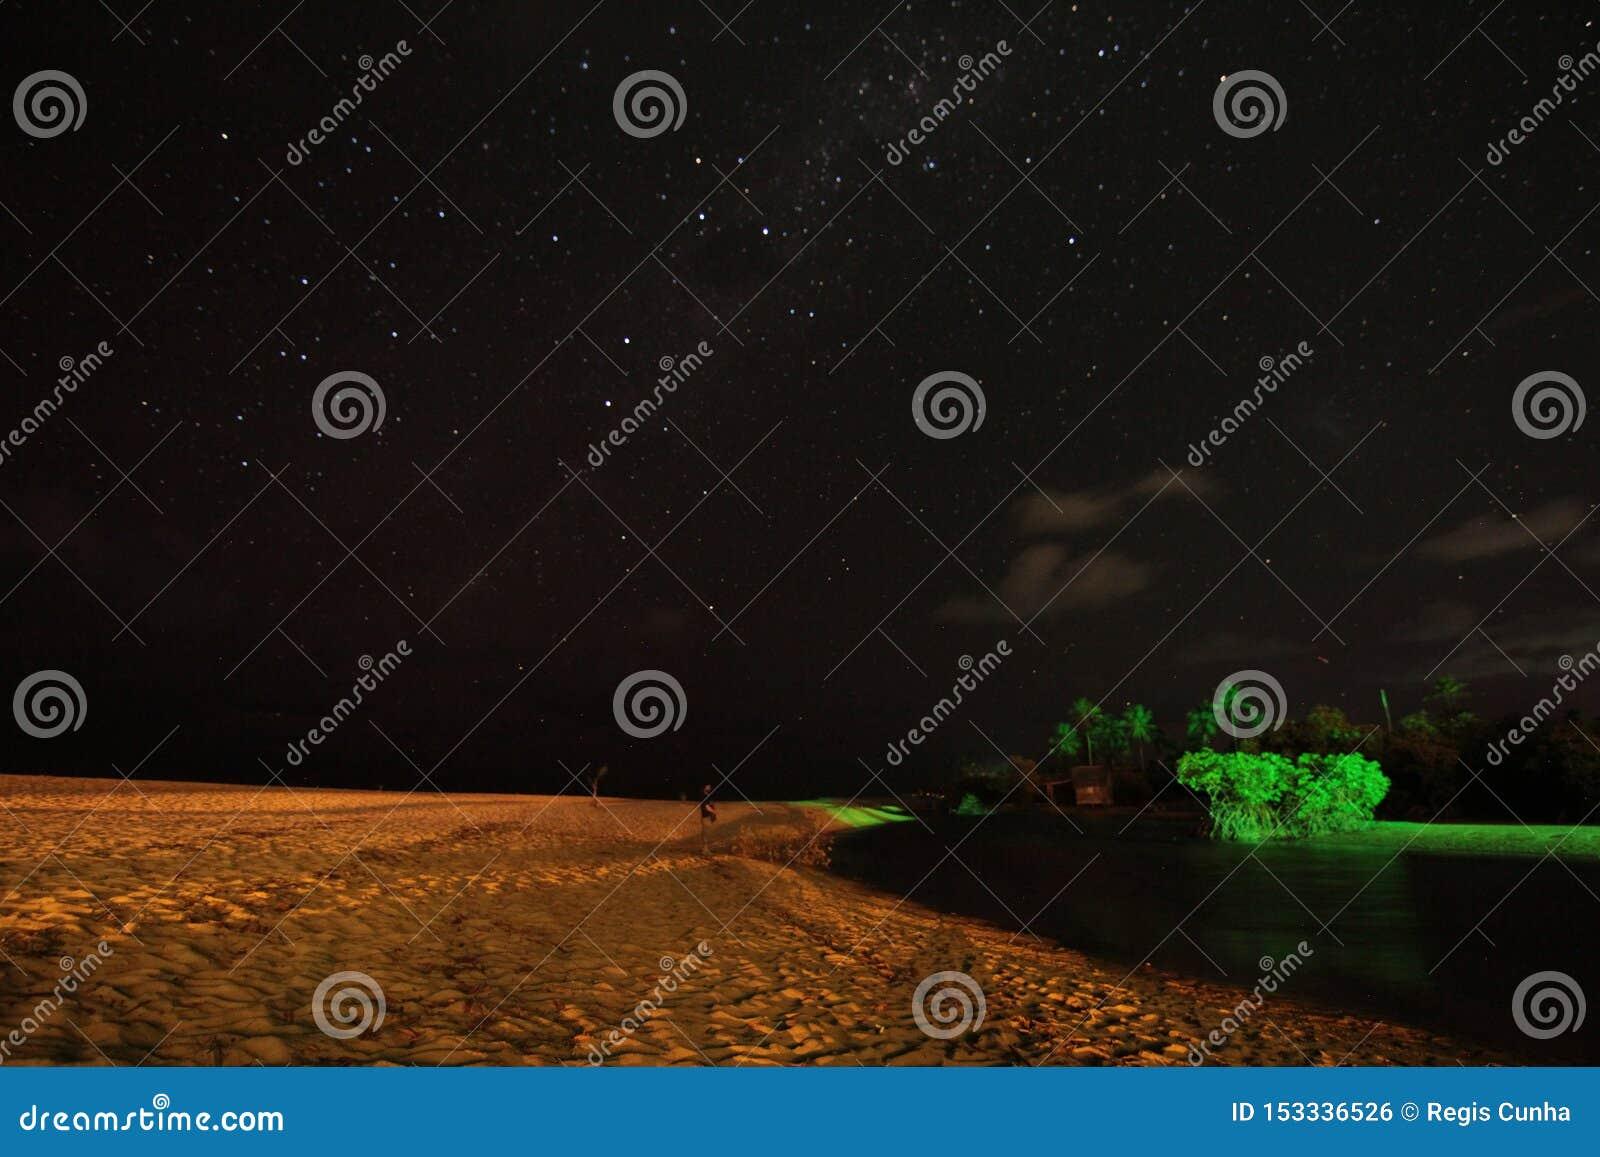 Stelle nel cielo notturno